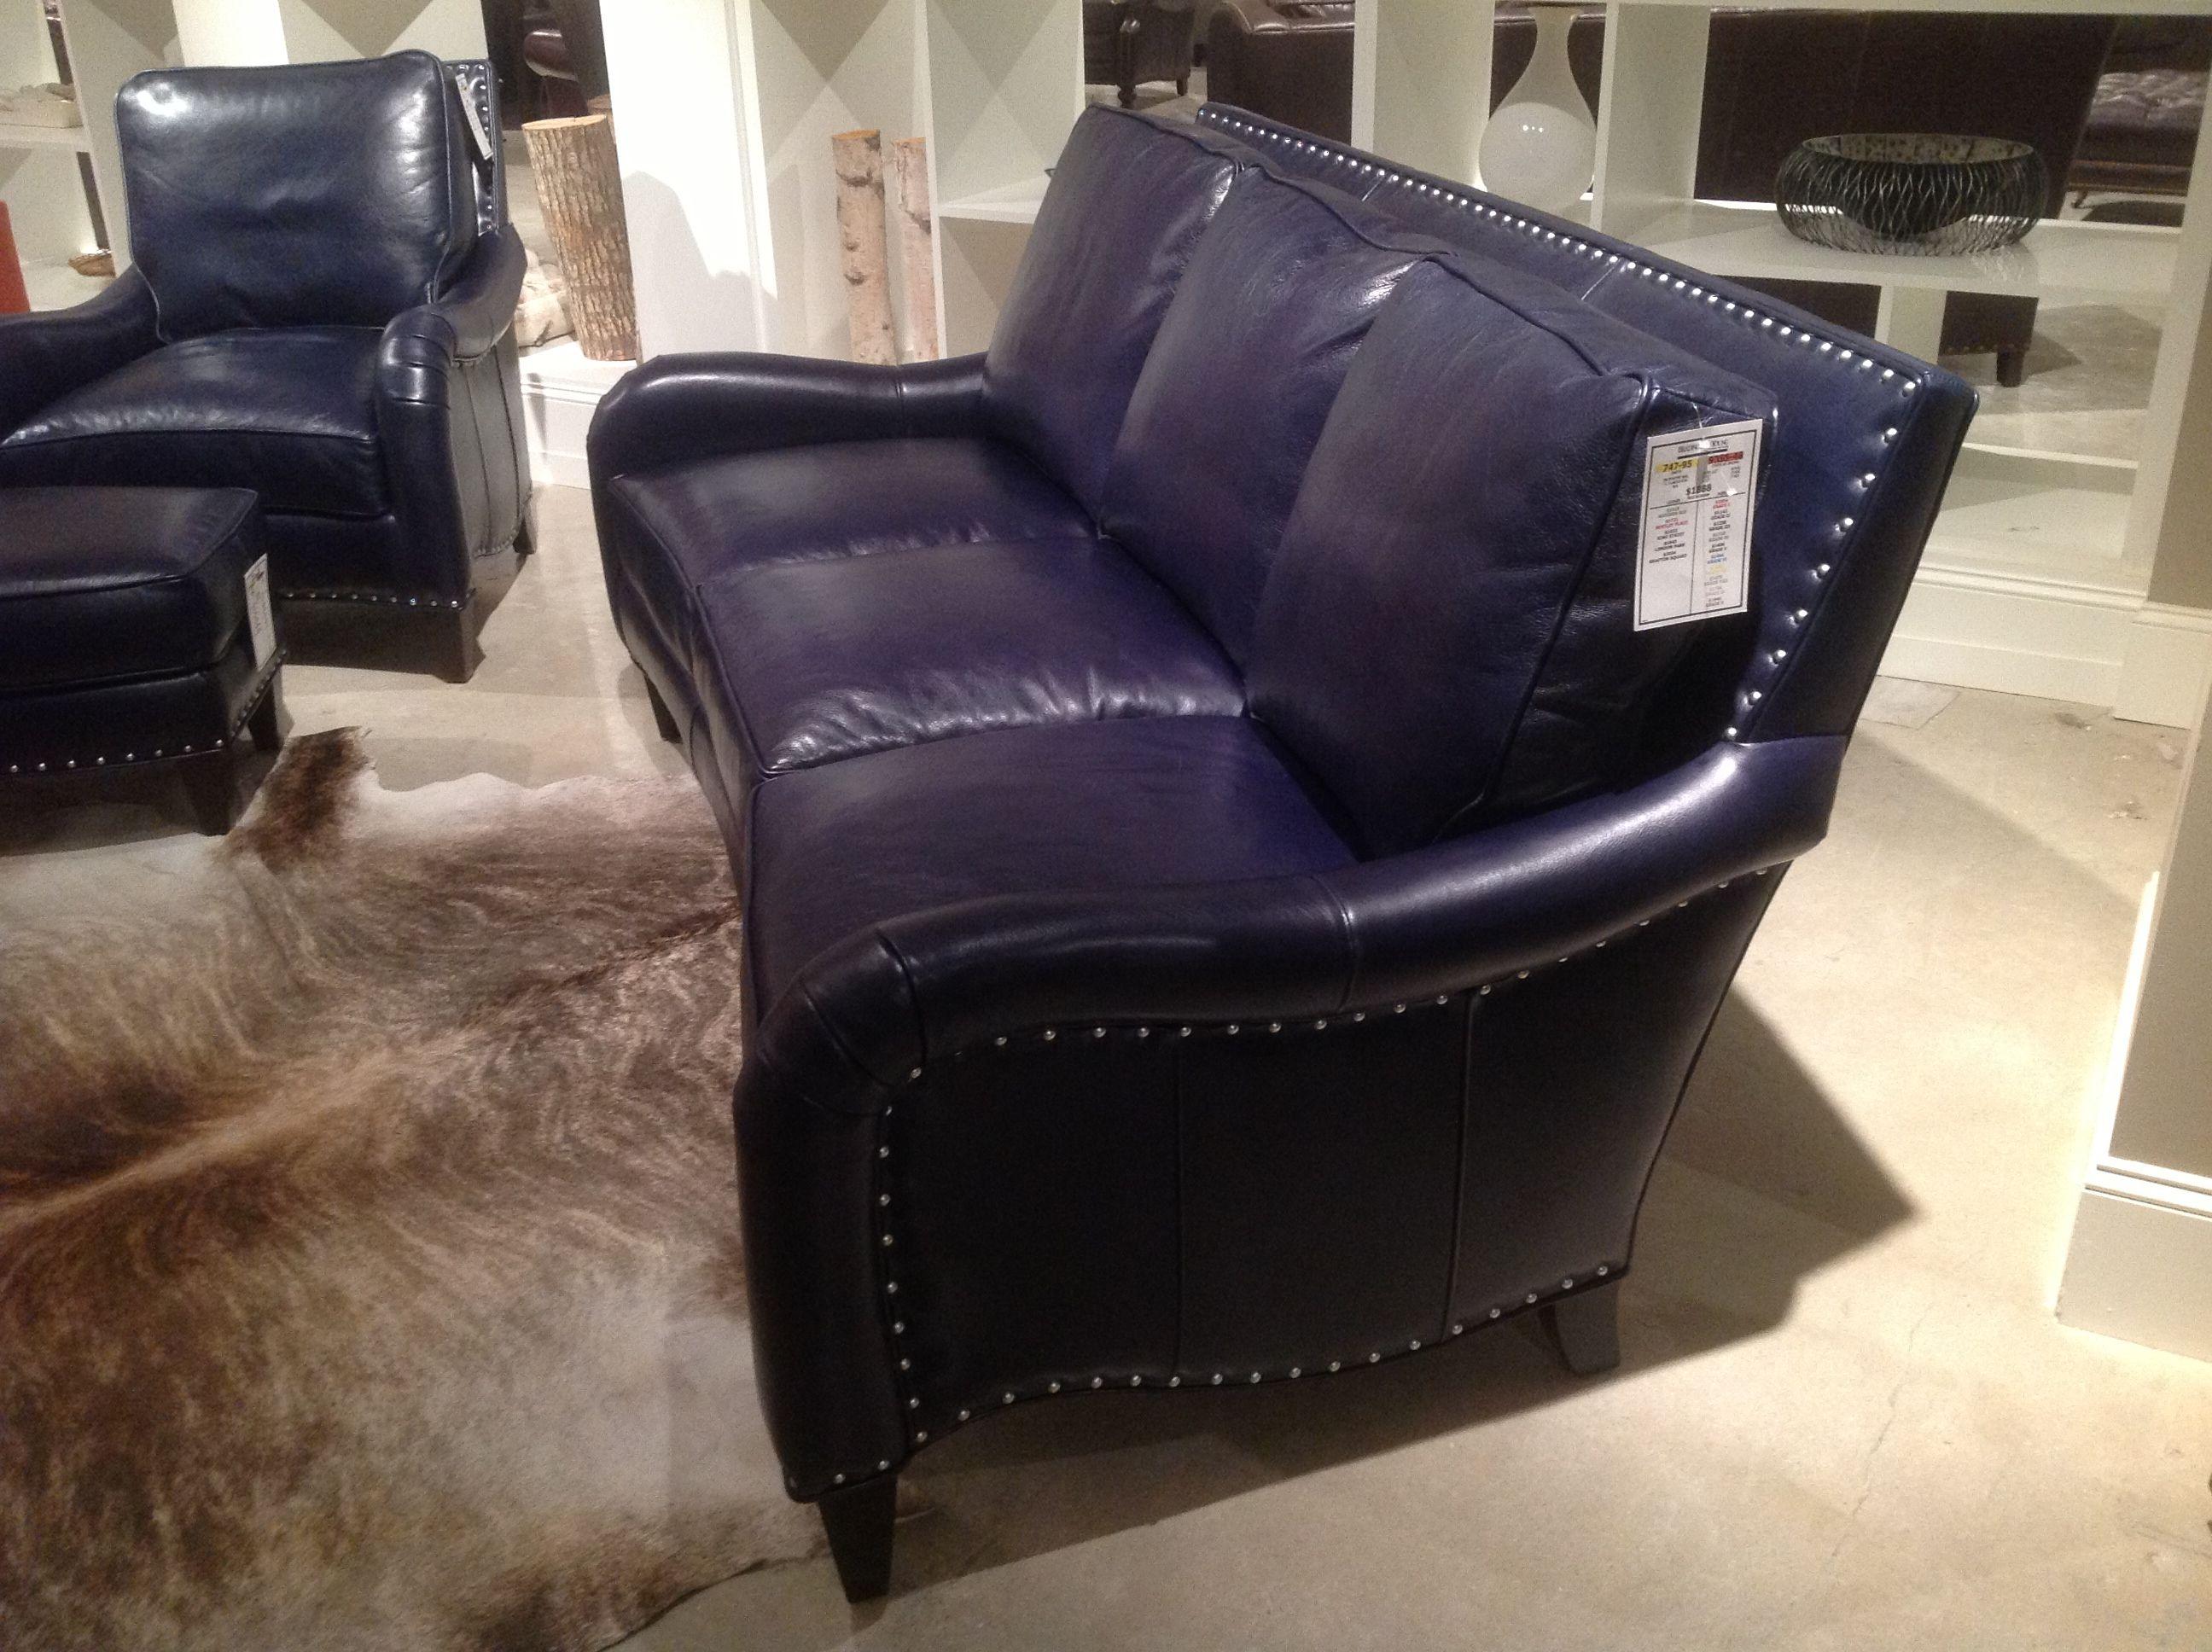 blue leather sofas clark rubber bondi sofa bed decoration livingroom